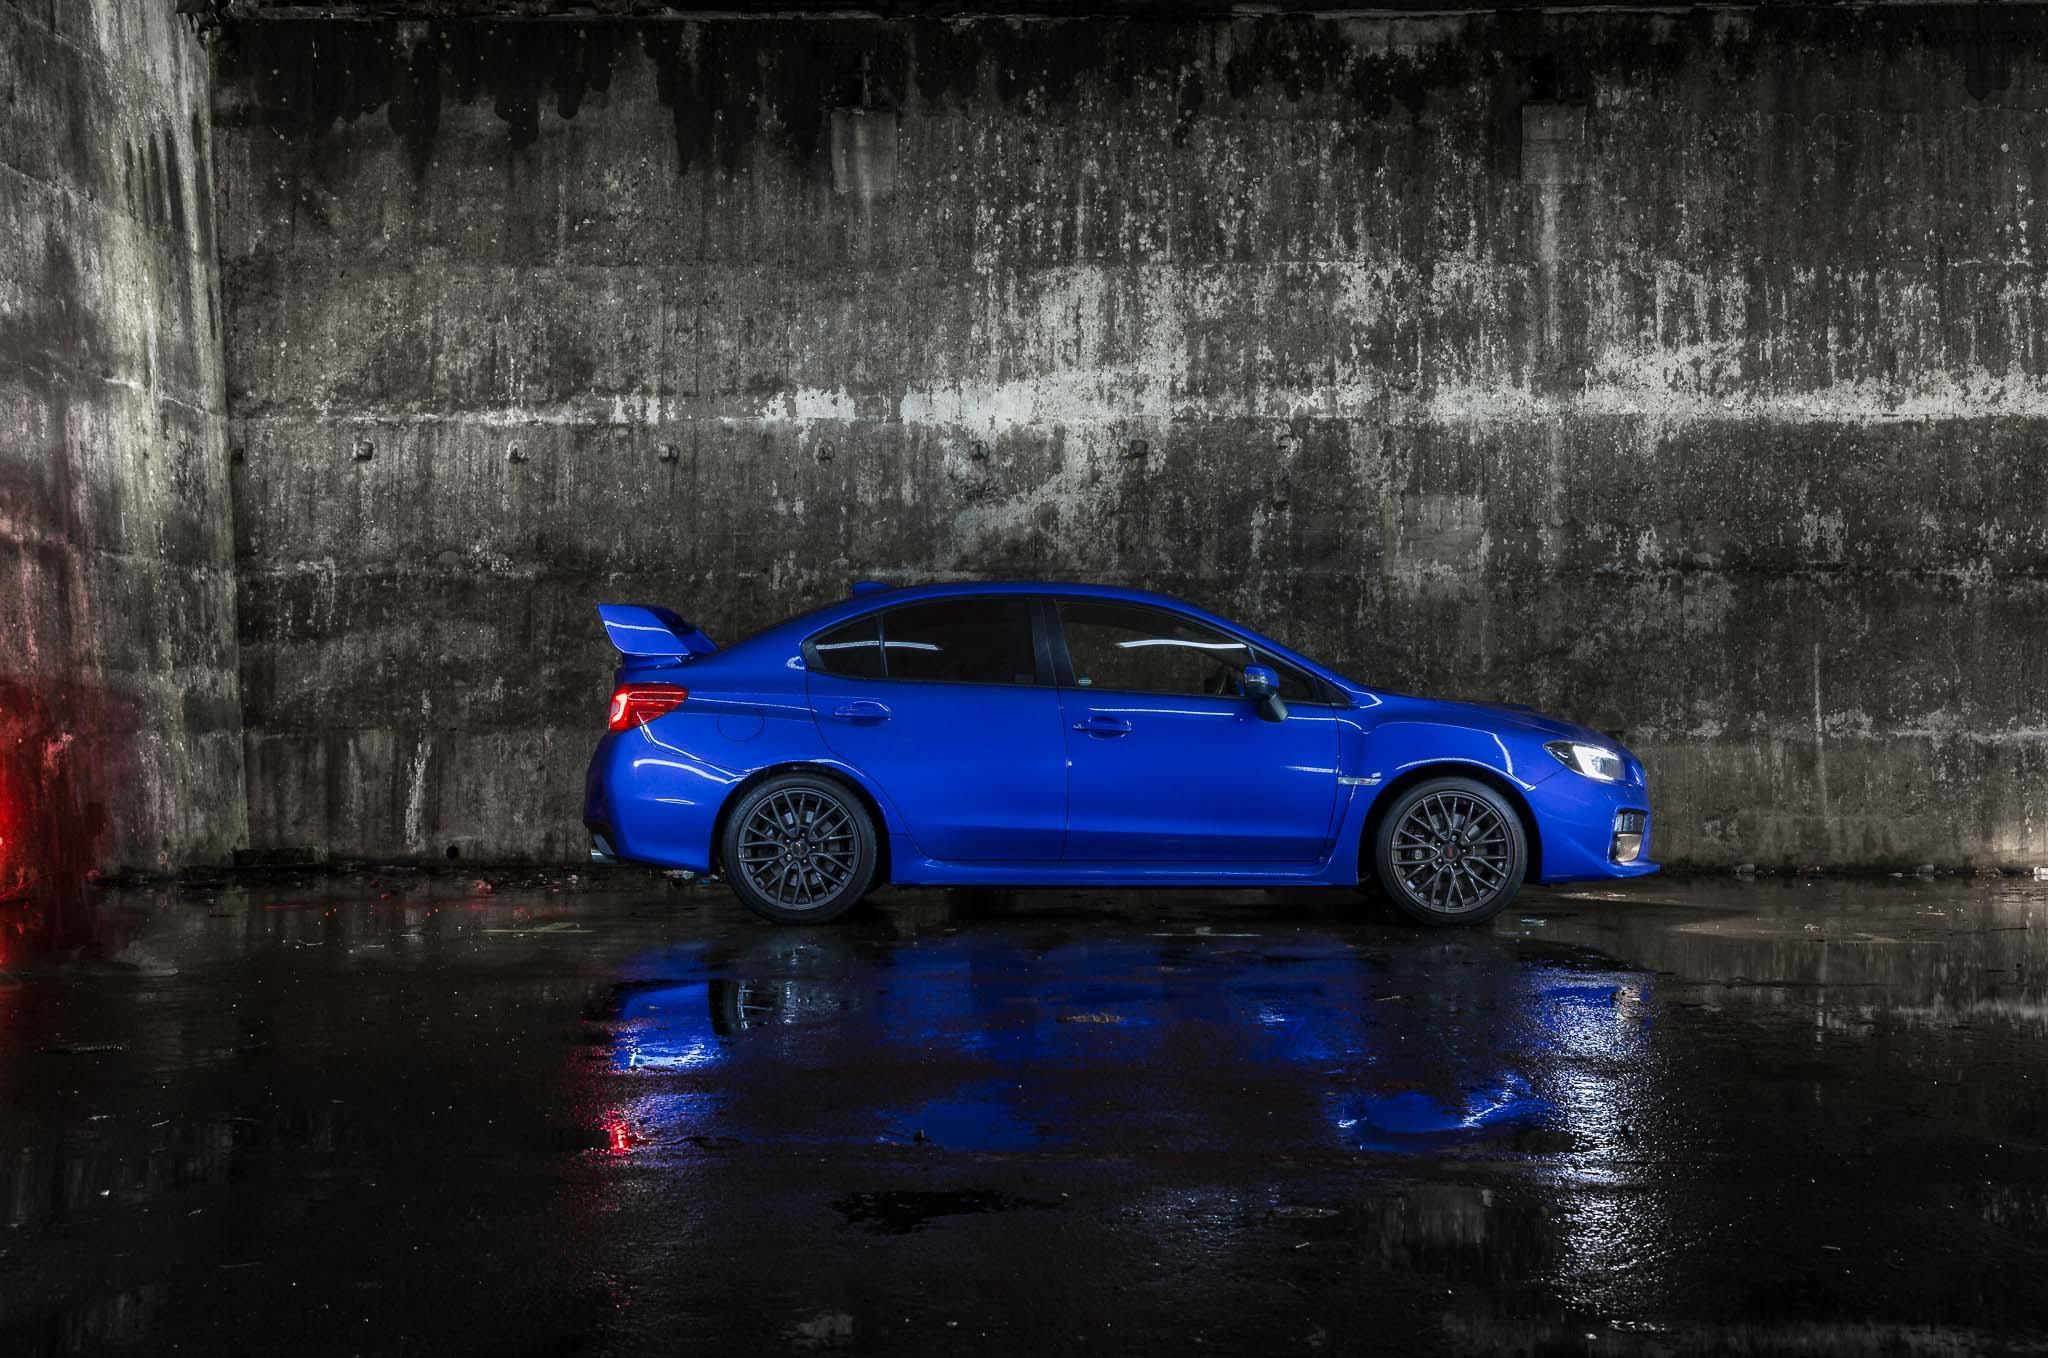 Subaru Wrx Sti Wallpaper